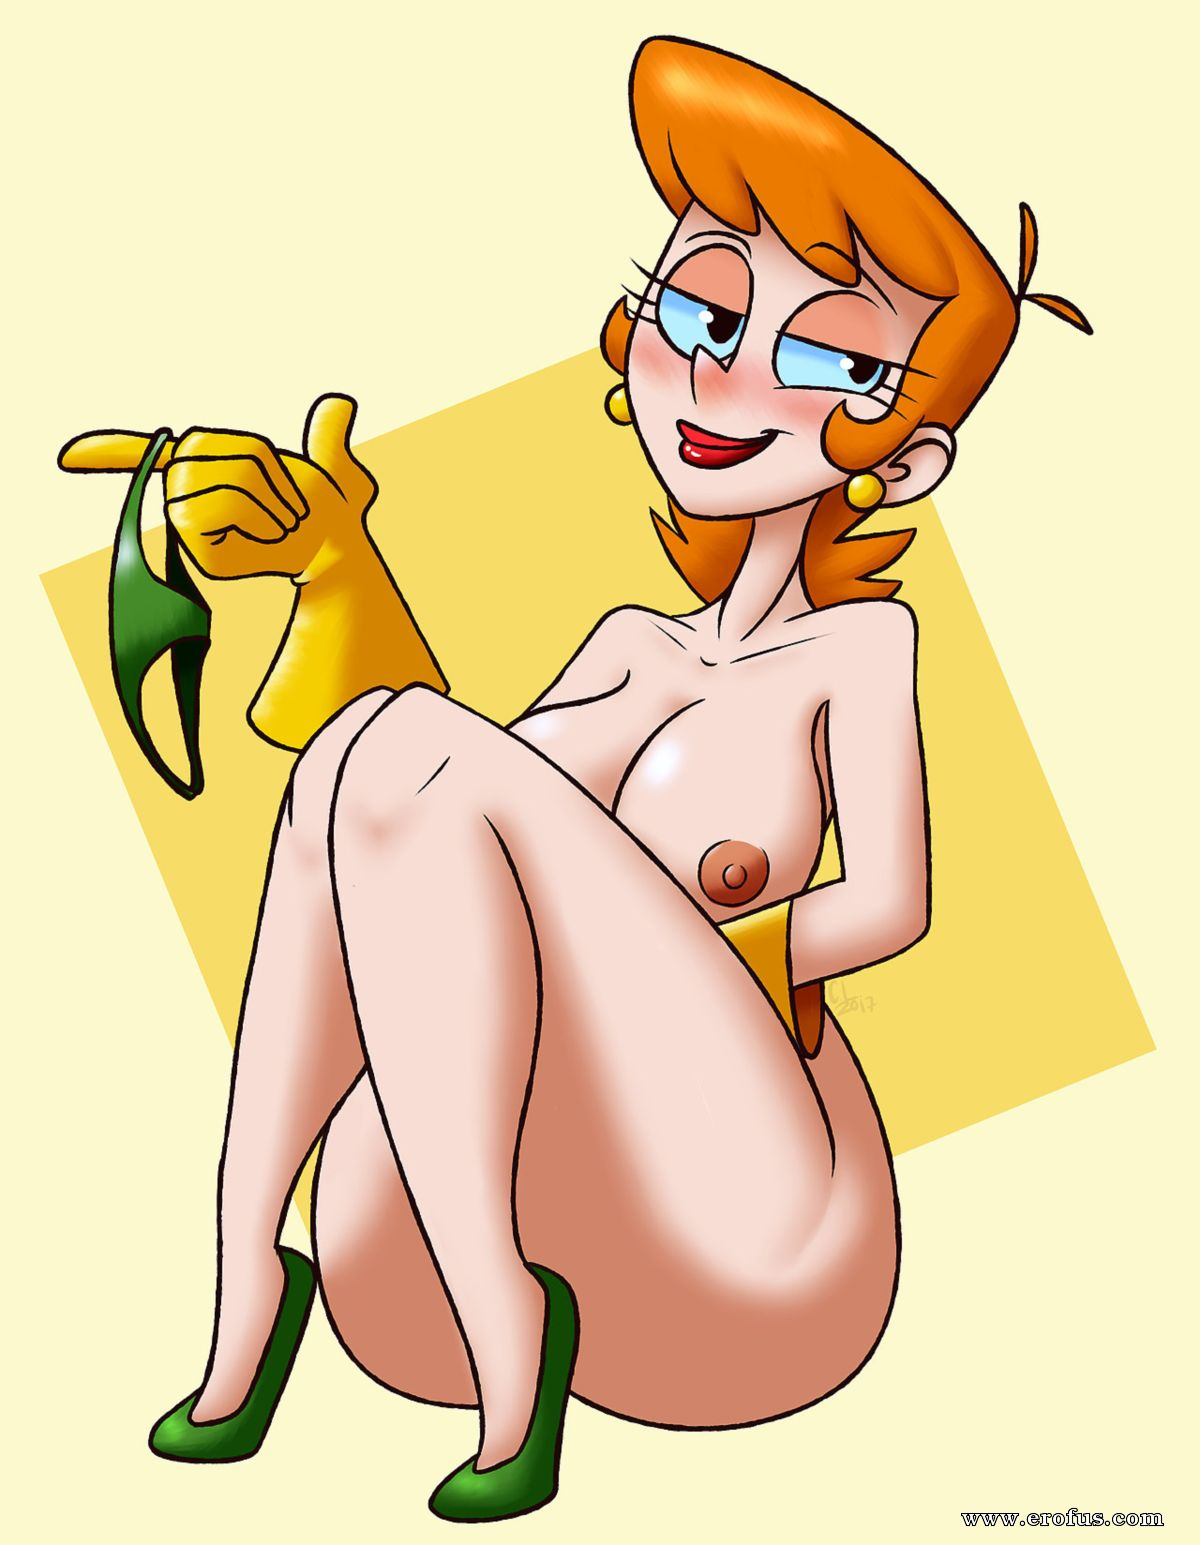 Dexter Laboratory Mom Naked Milf